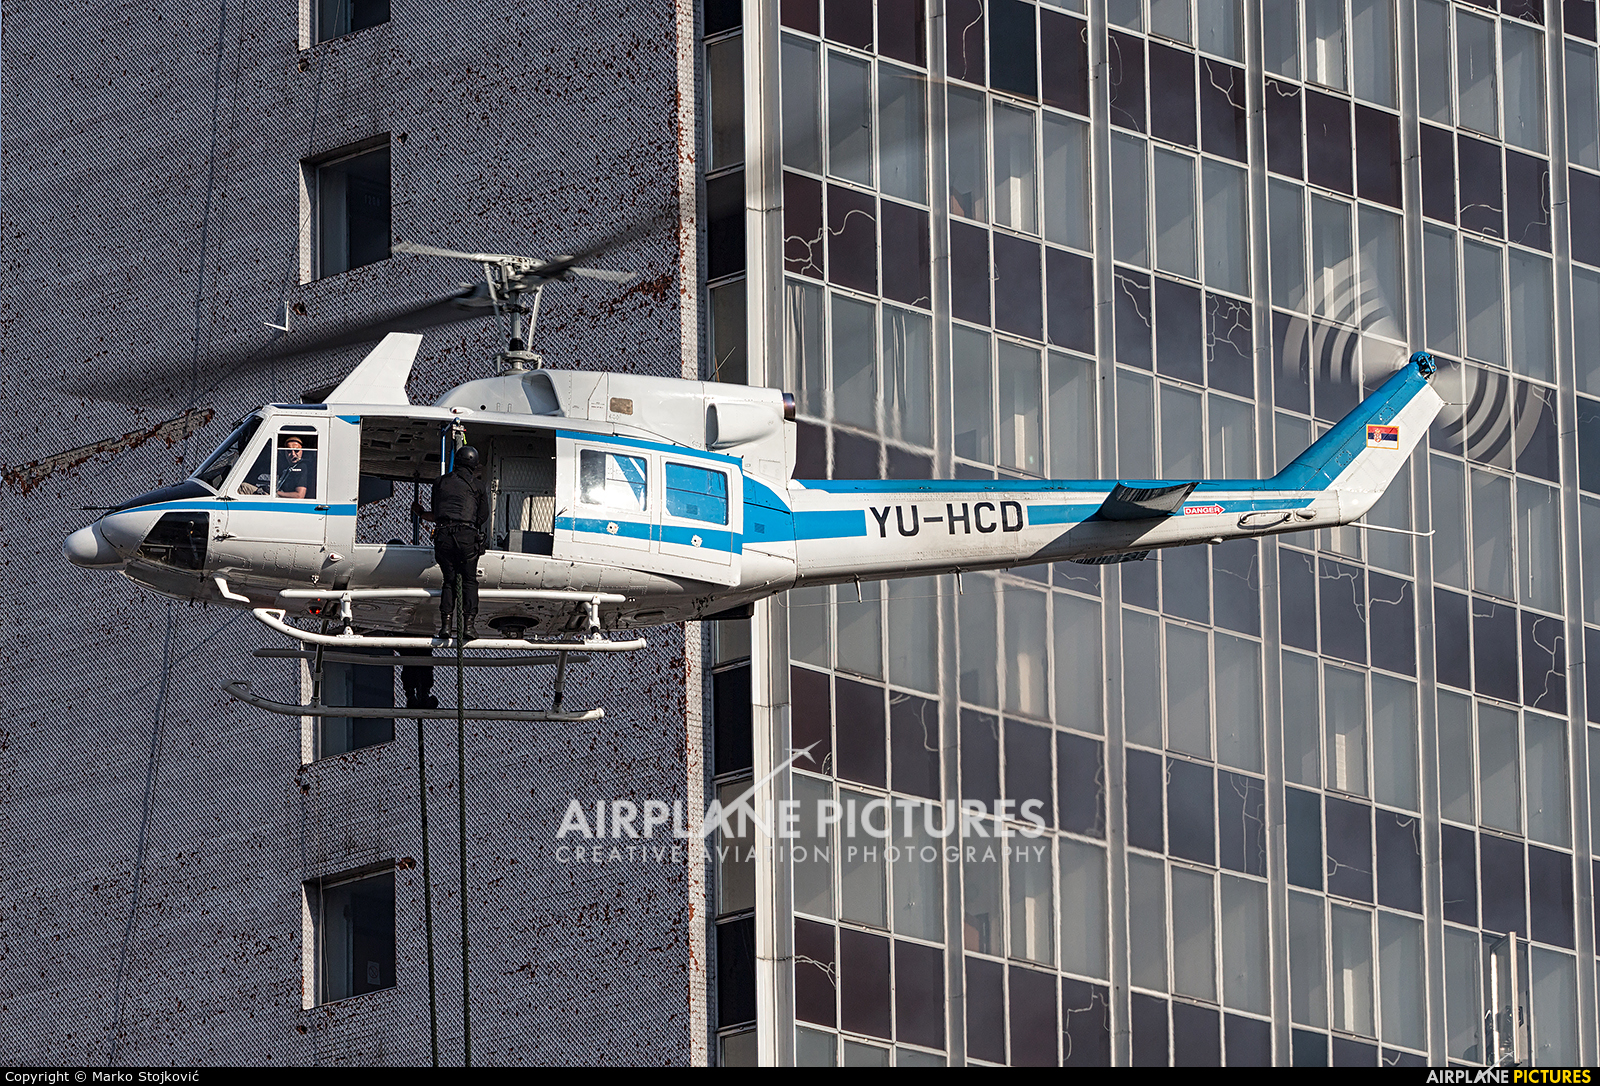 Serbia - Police YU-HCD aircraft at In Flight - Serbia